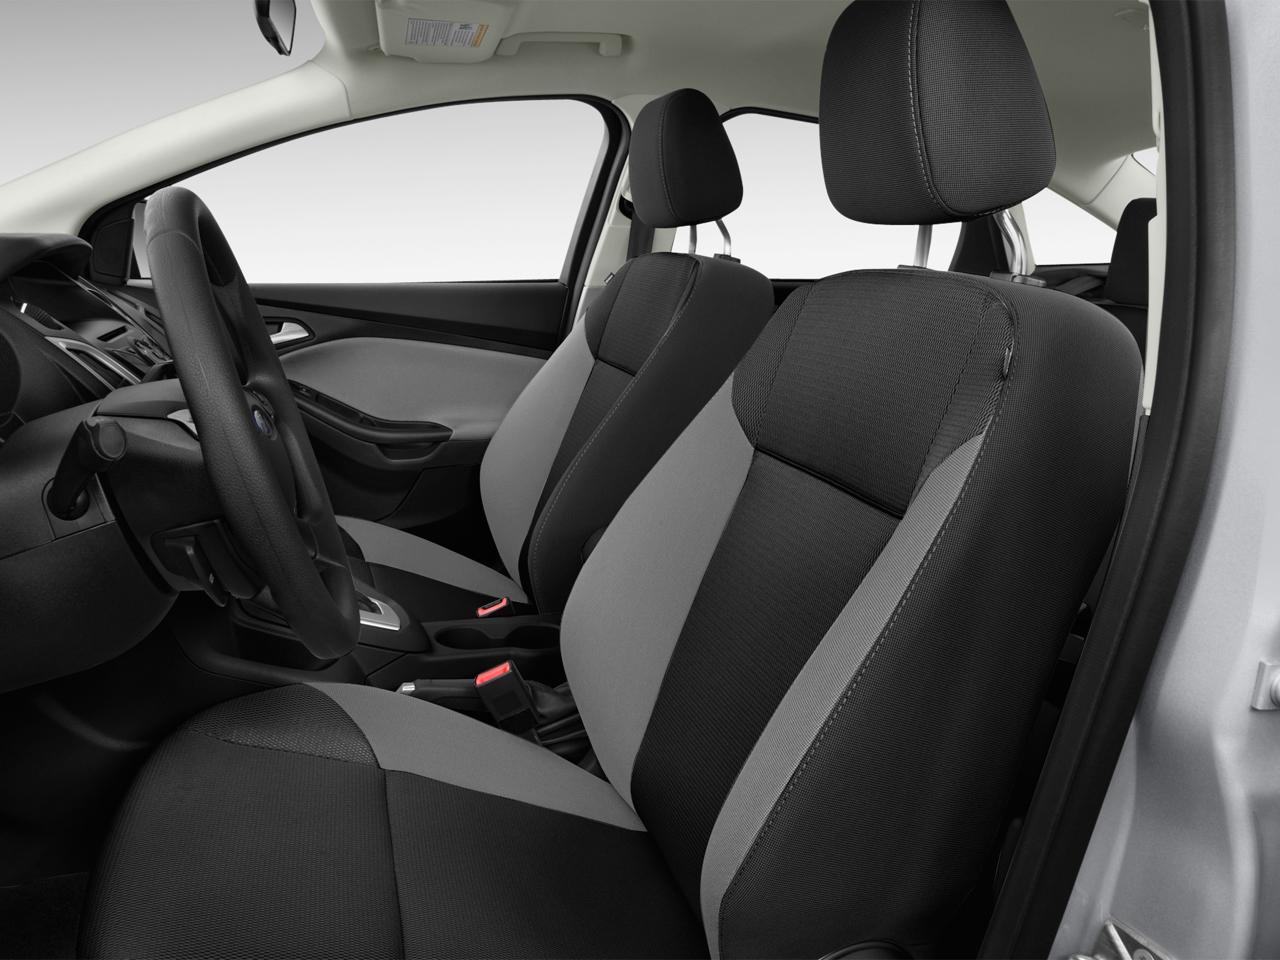 used one owner 2014 ford focus se near mount morris pa joe romeos i 79 honda mazda - Ford Focus 2014 Sedan Interior